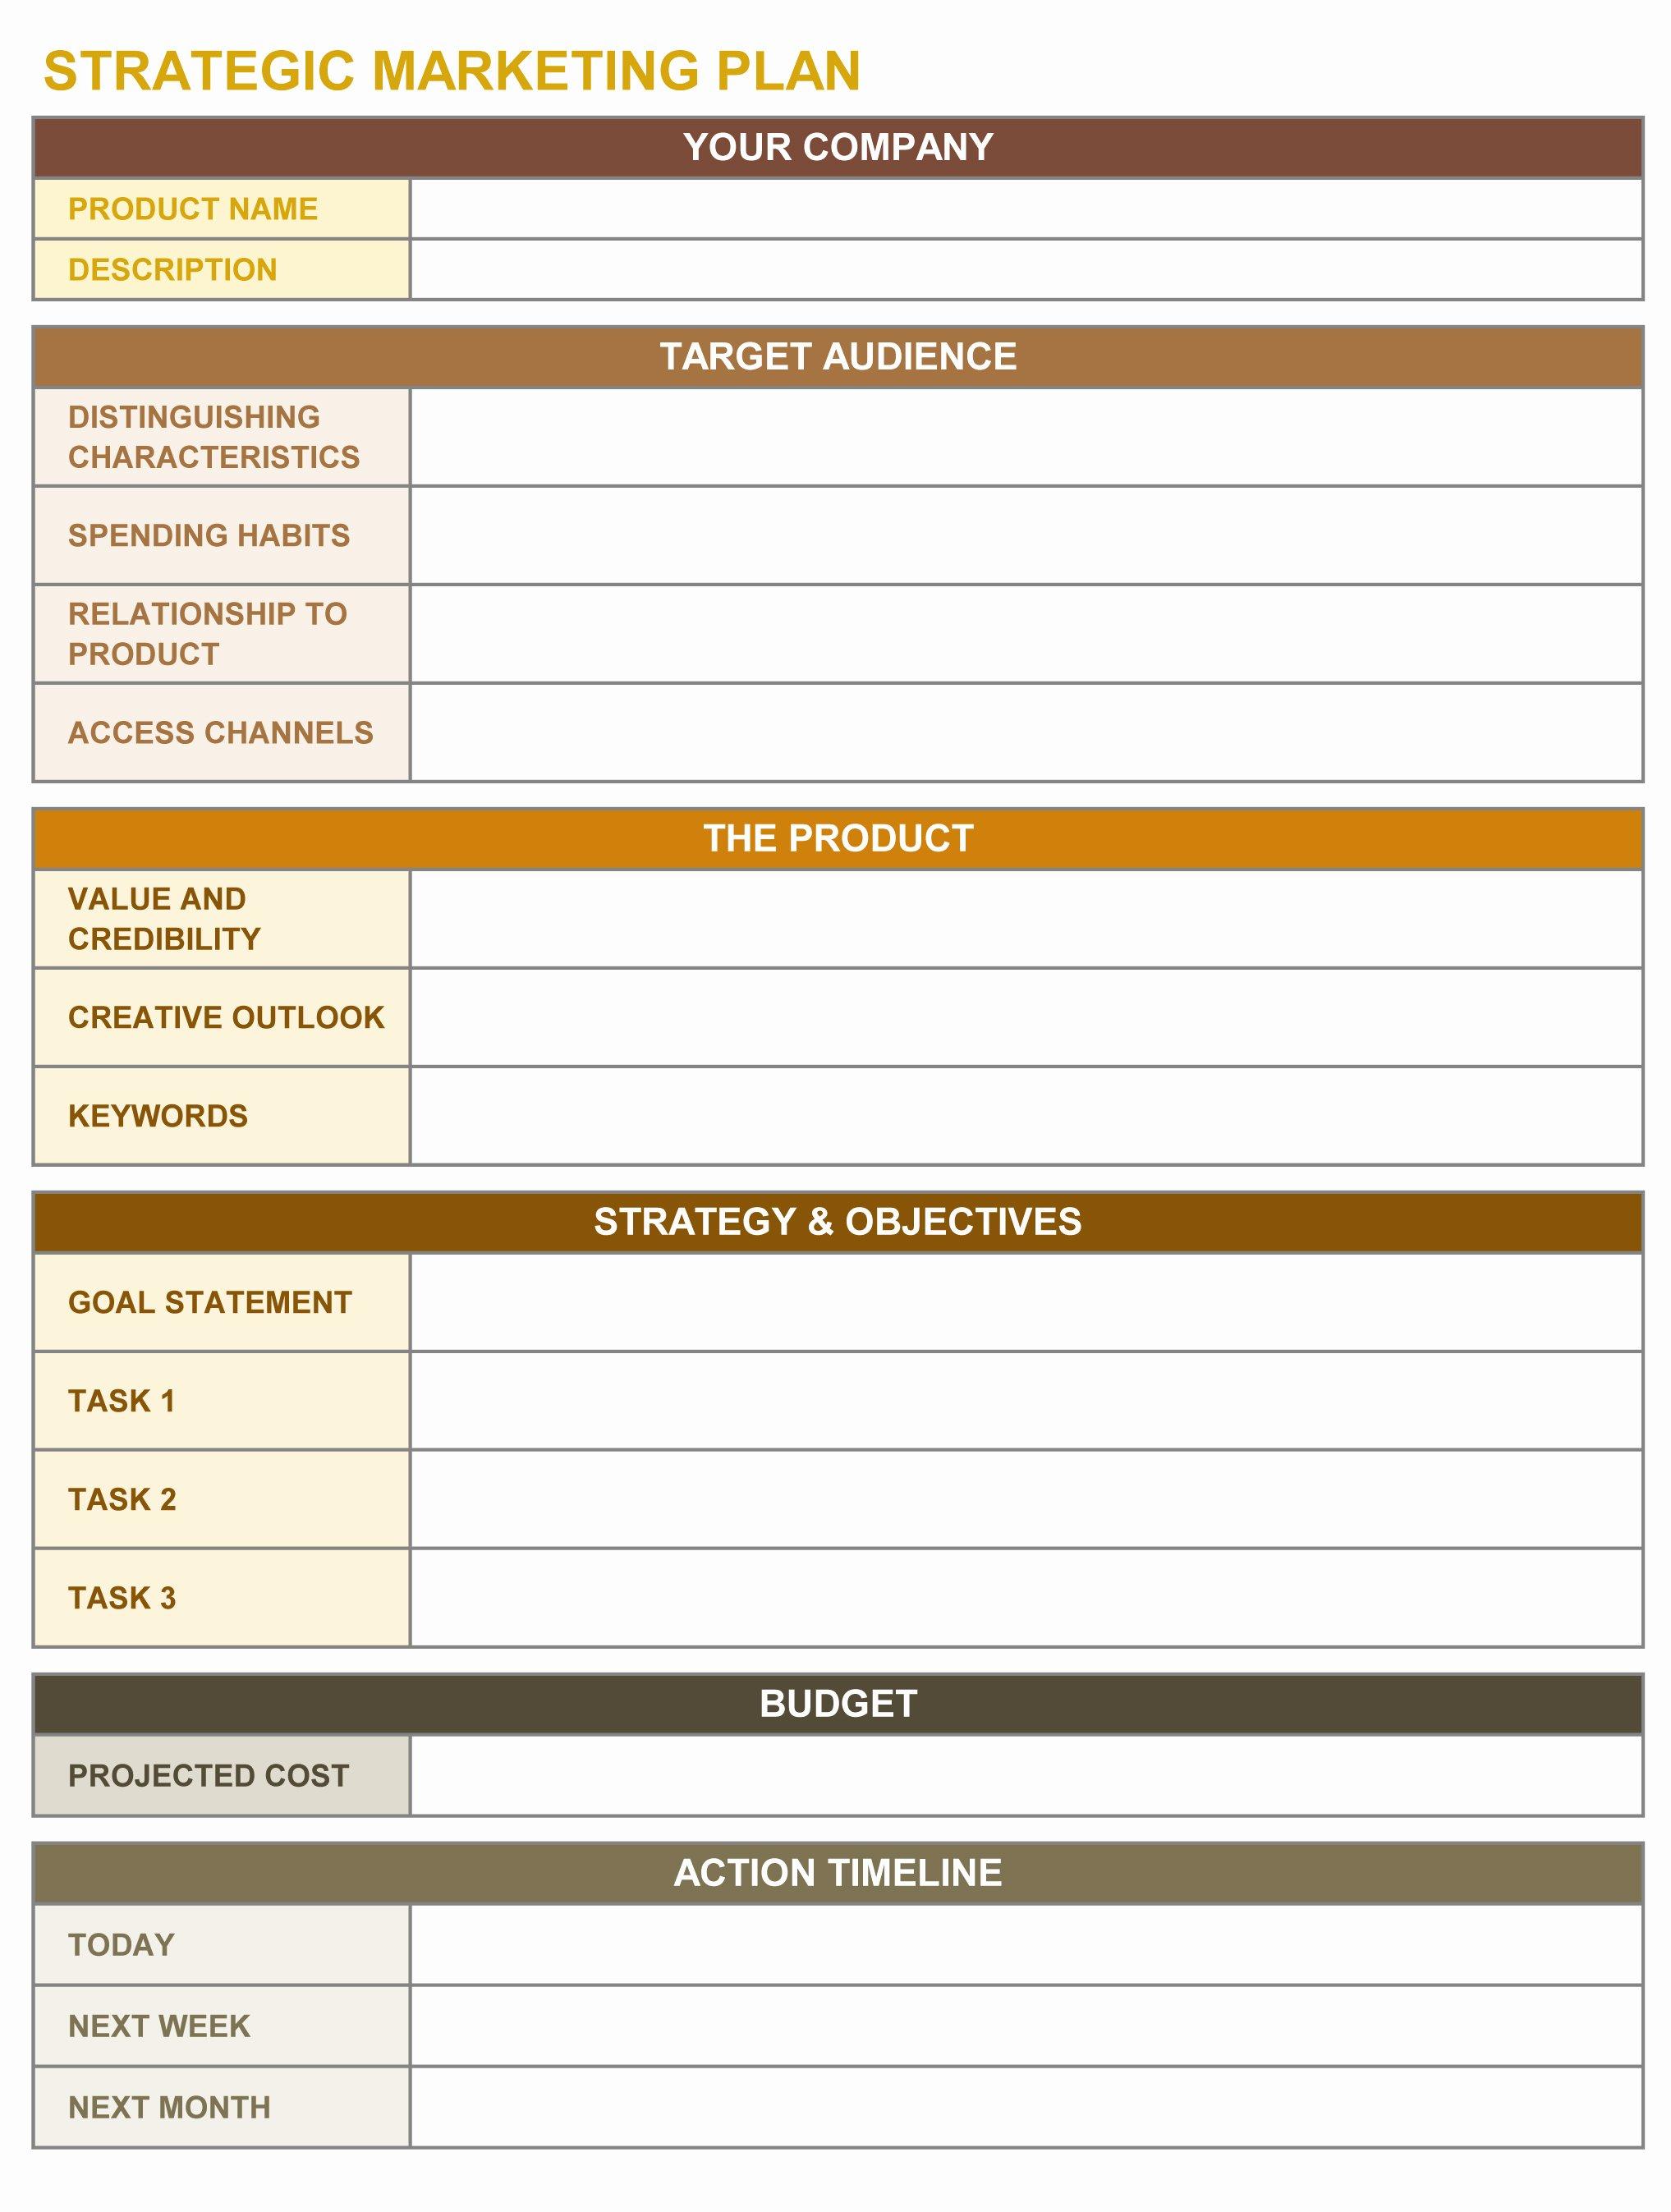 Excel Marketing Plan Template Beautiful 9 Free Strategic Planning Templates Smartsheet